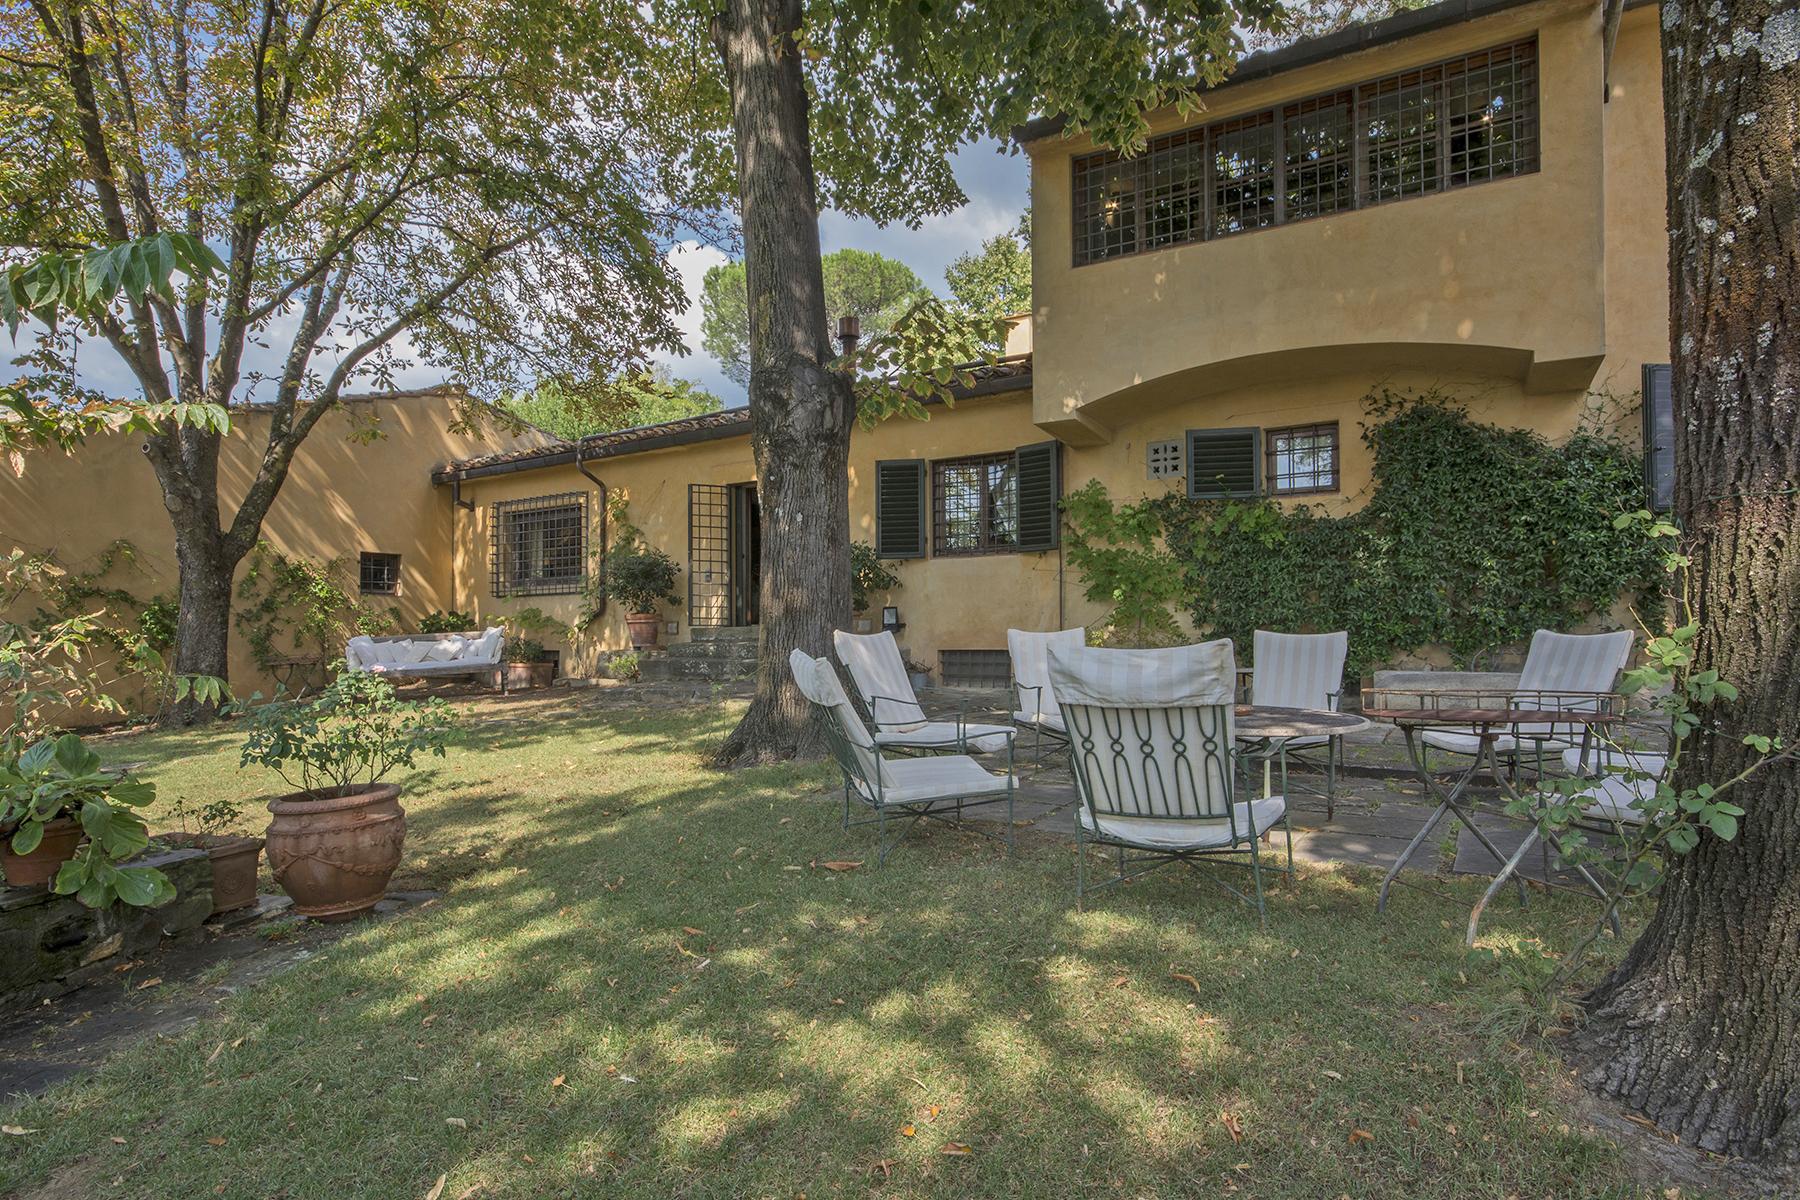 Single Family Home for Sale at Beautiful villa in Fiesole Via delle Fontanelle Fiesole, 50014 Italy